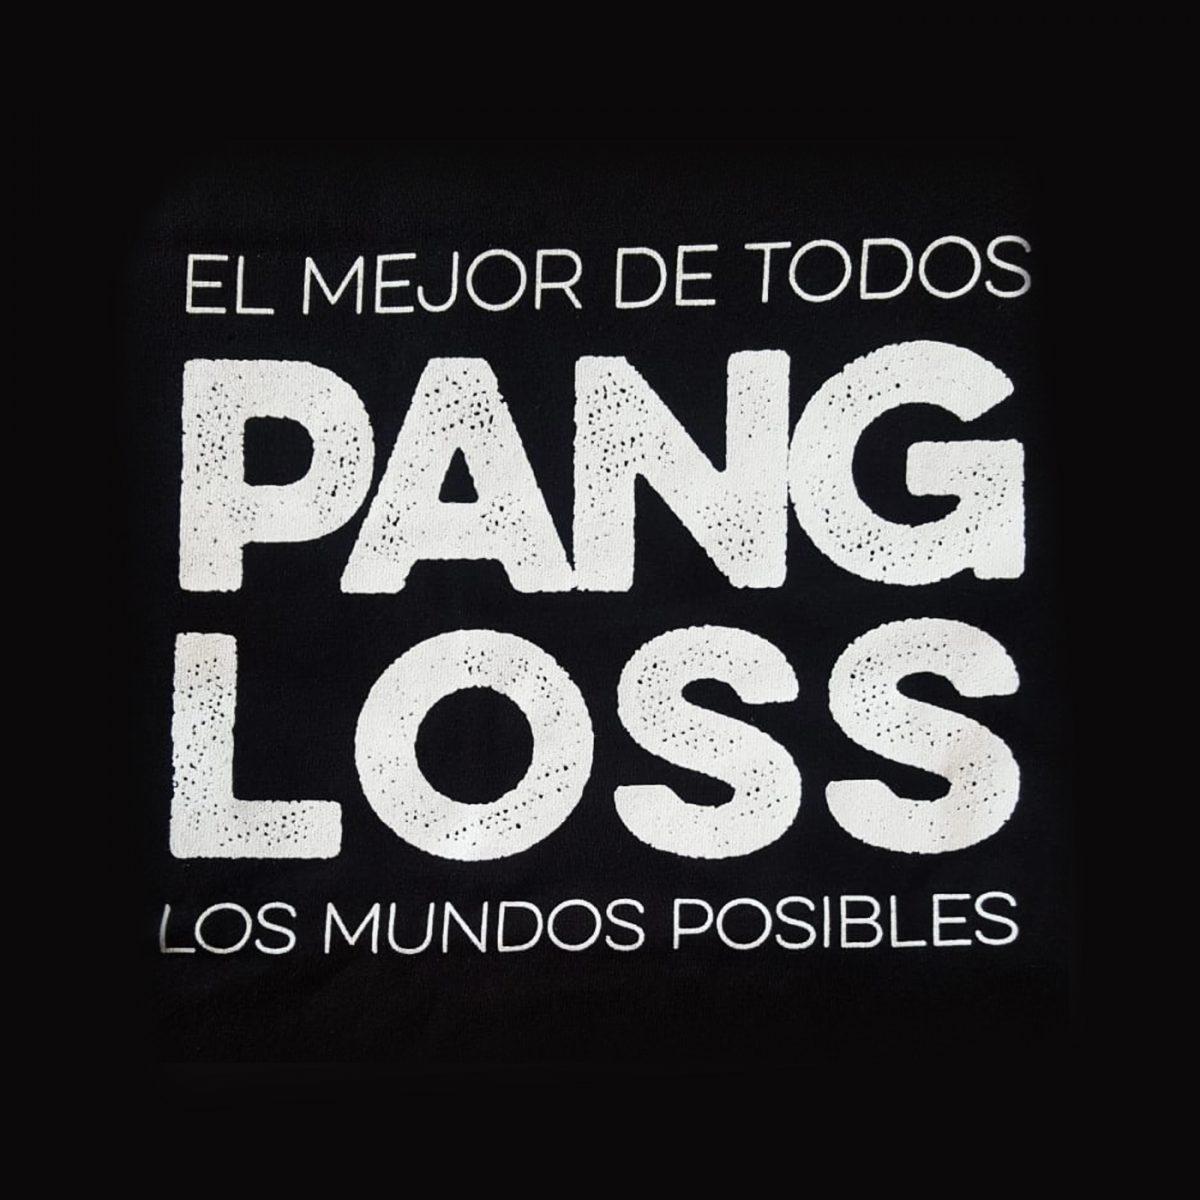 PGchico_sello02